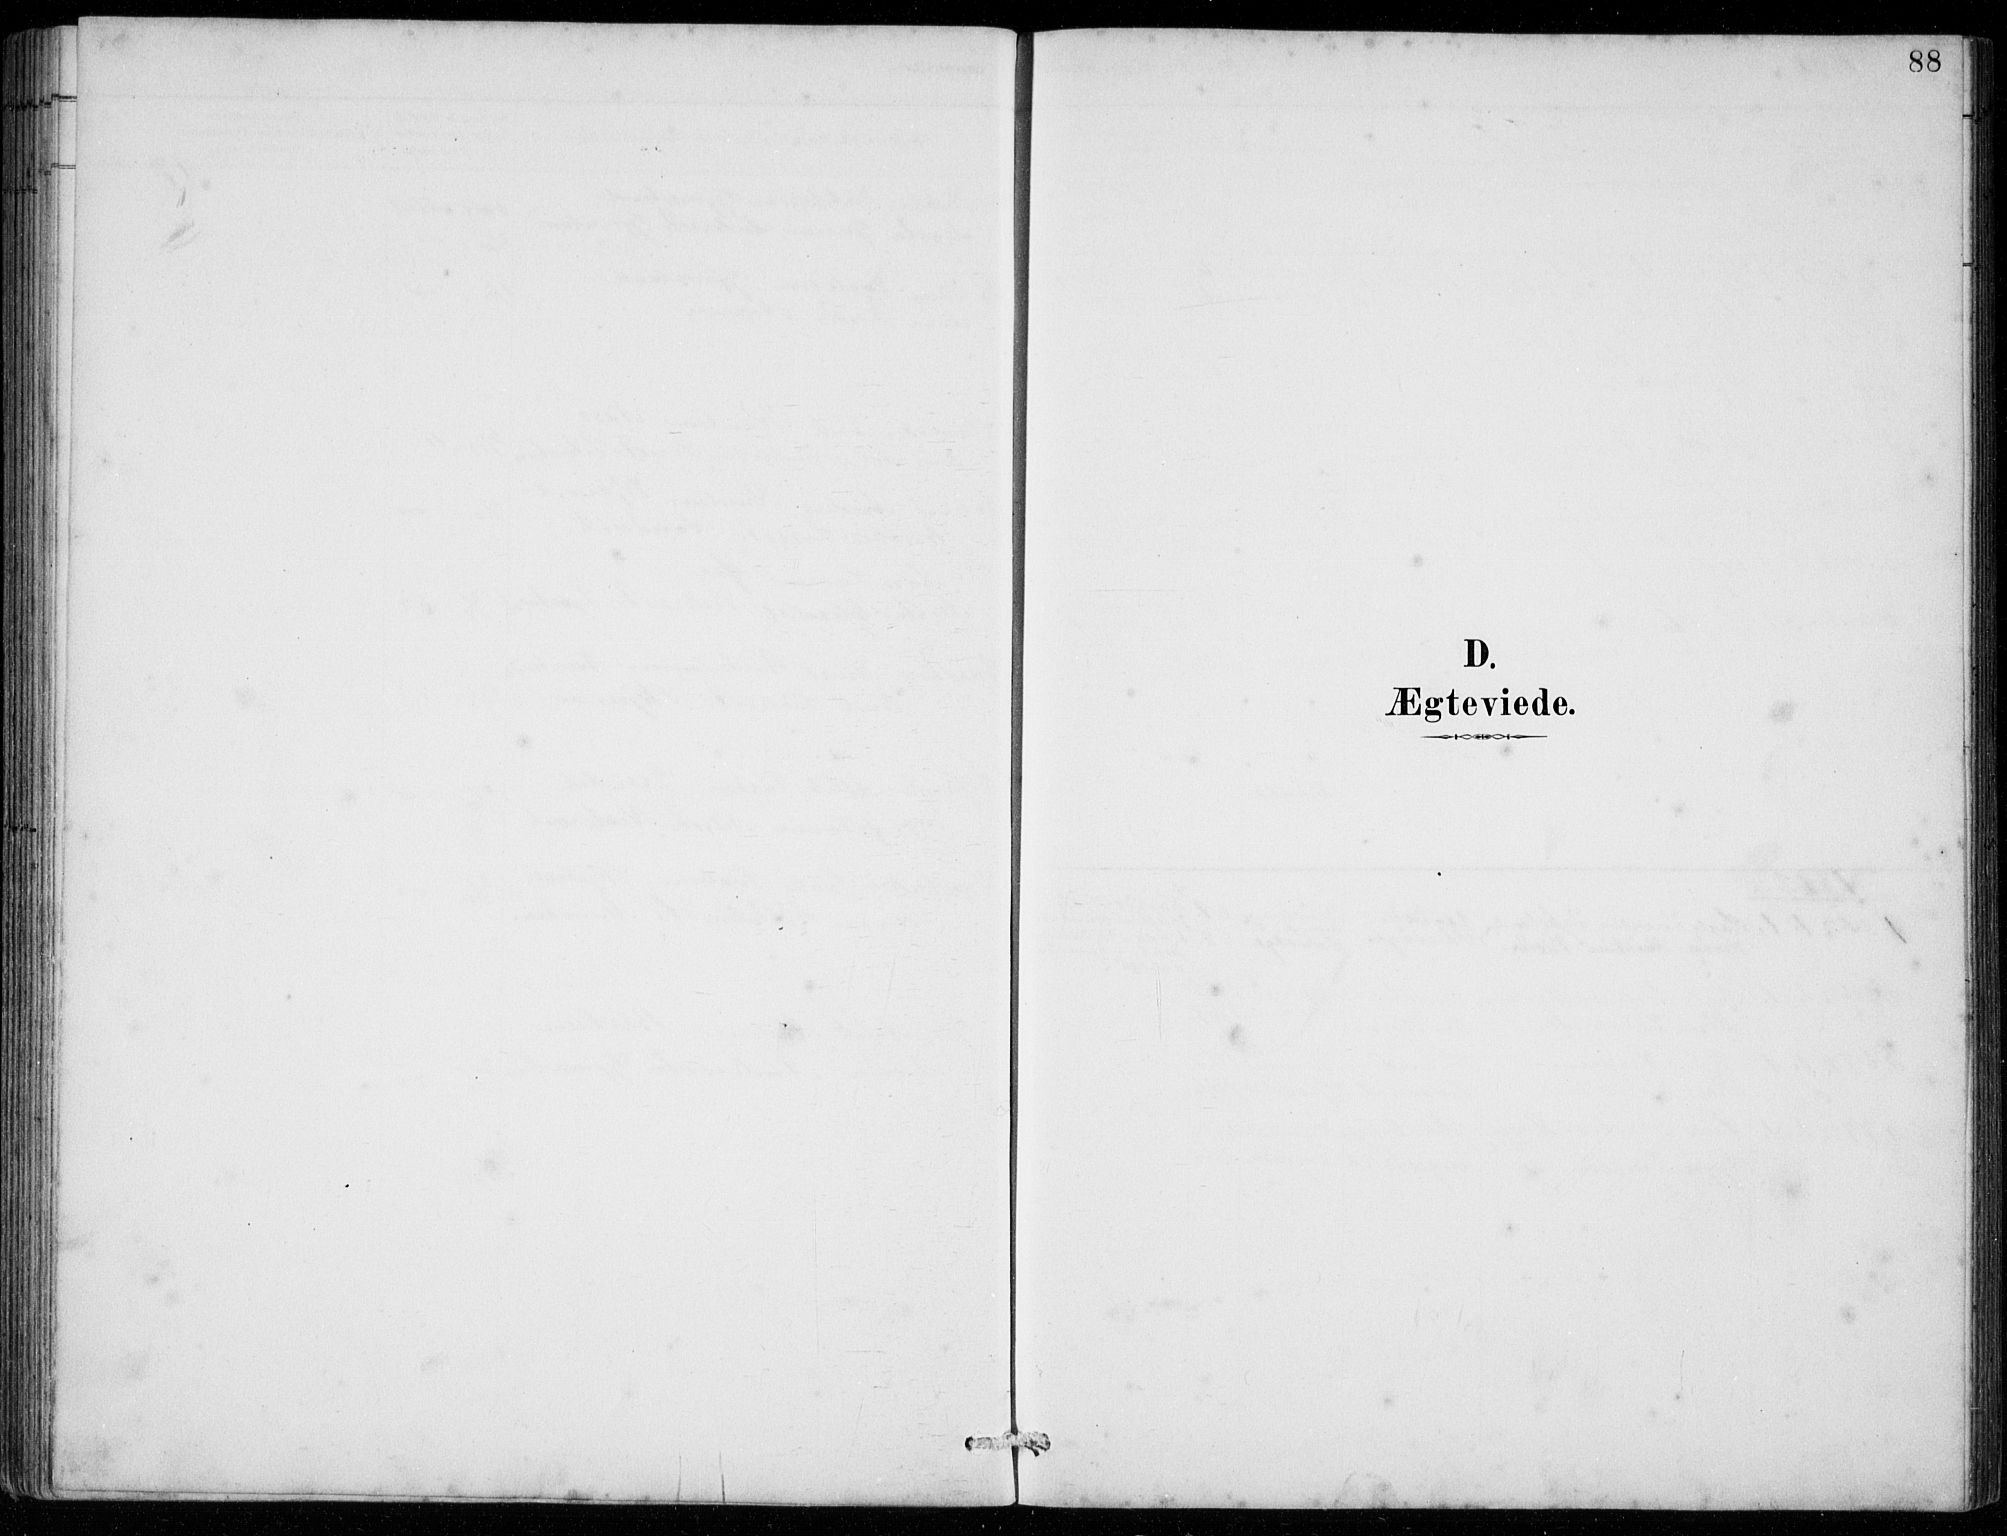 SAB, Strandebarm sokneprestembete, H/Hab: Klokkerbok nr. C  1, 1891-1913, s. 88